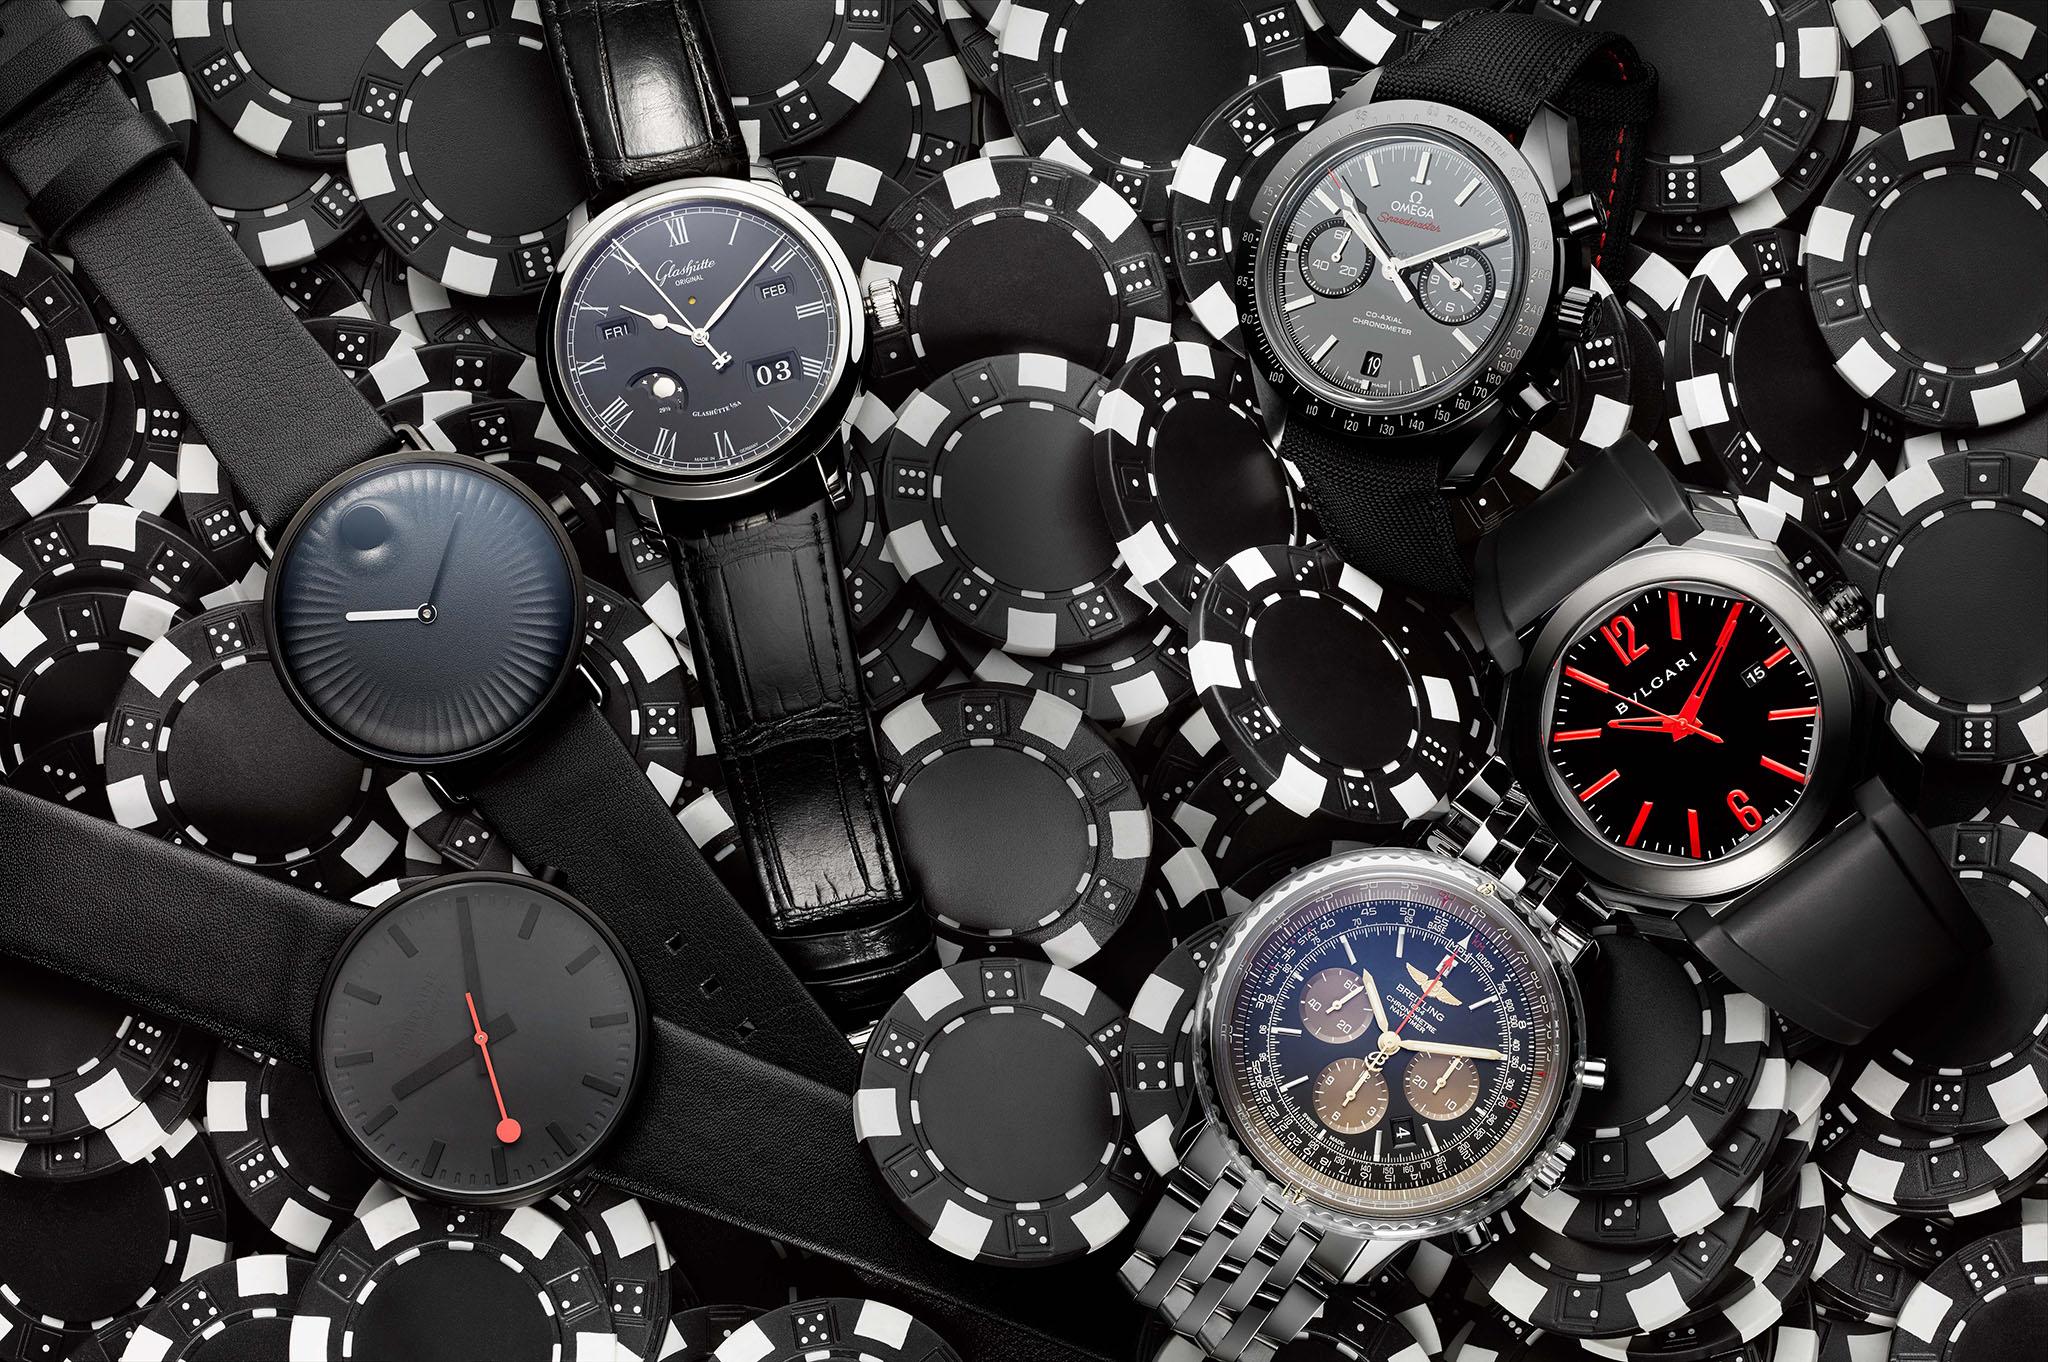 Clockwise from lower left: Mondaine, Movado, Glashutte, Omega, Bulgari and Breitling.